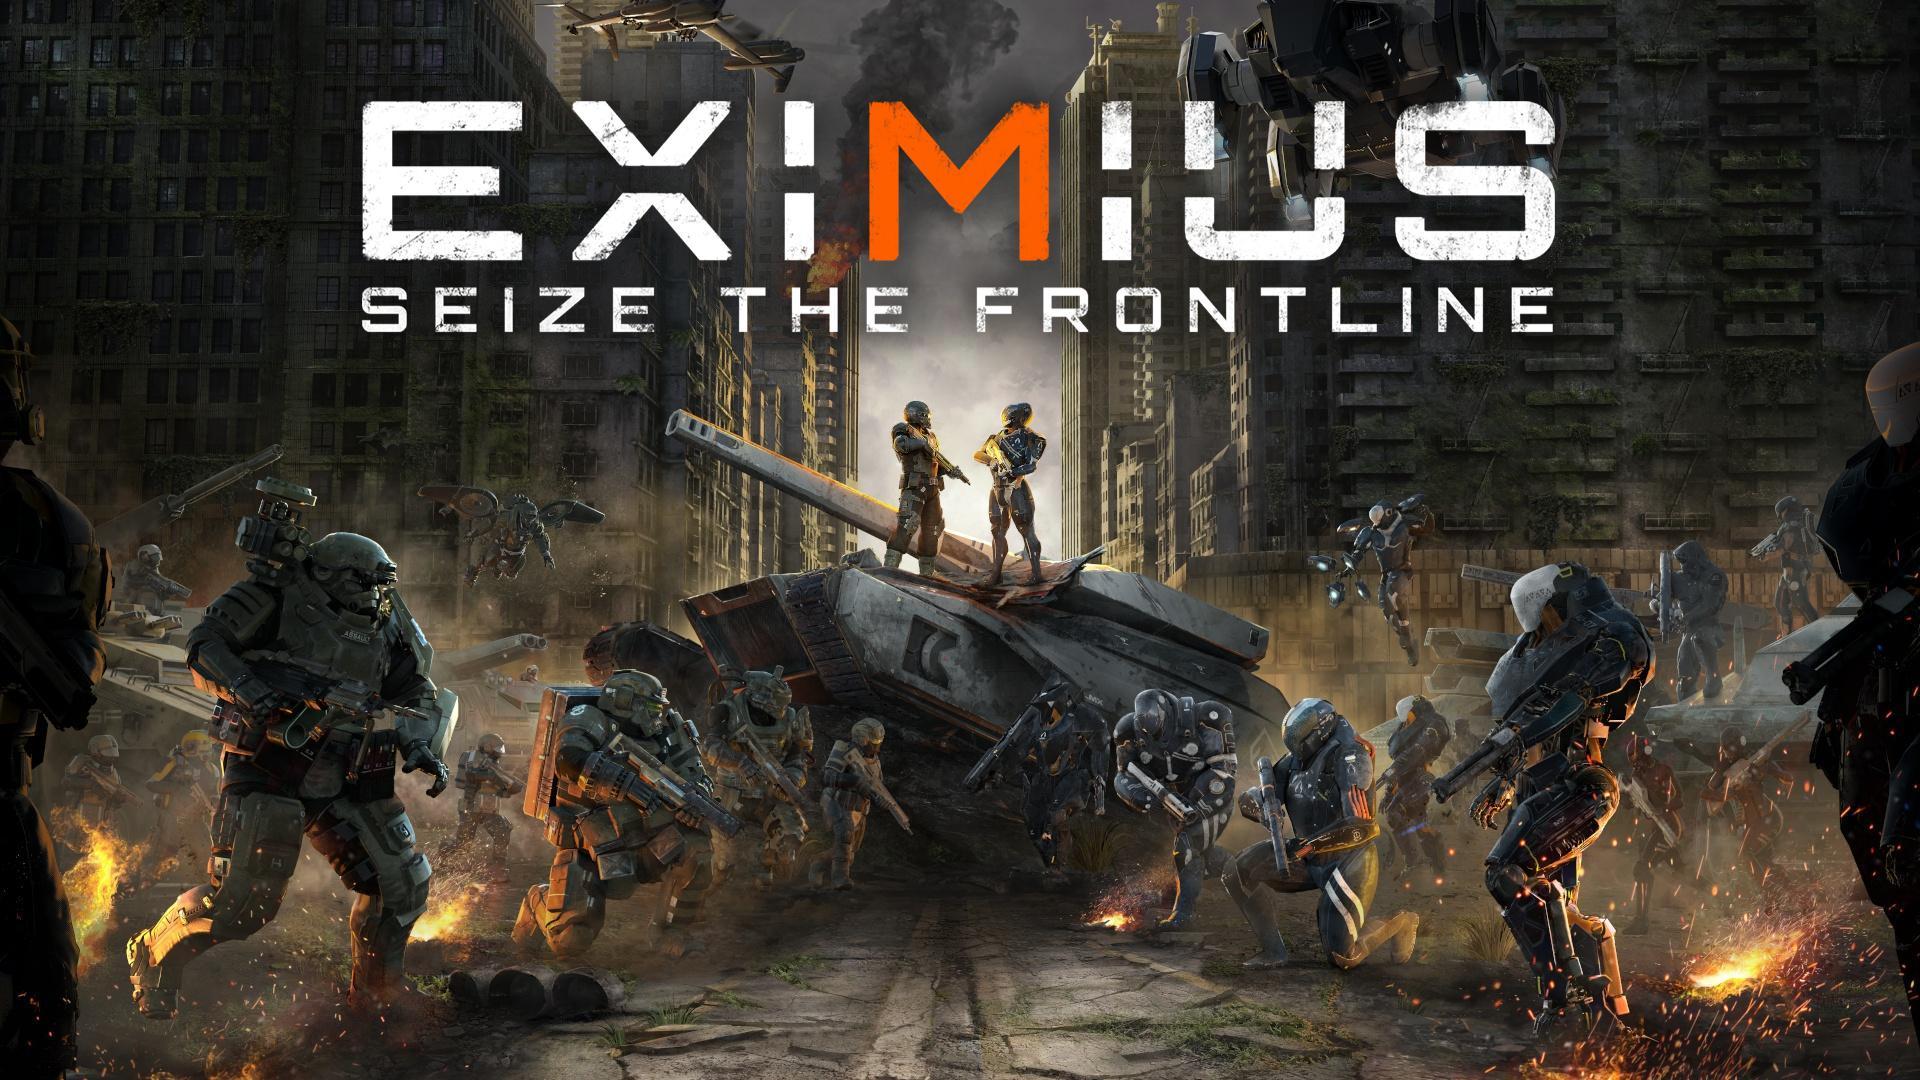 Permainan buatan Malaysia Eximius: Seize the Frontline akan tiba pada 16 Mac 2021